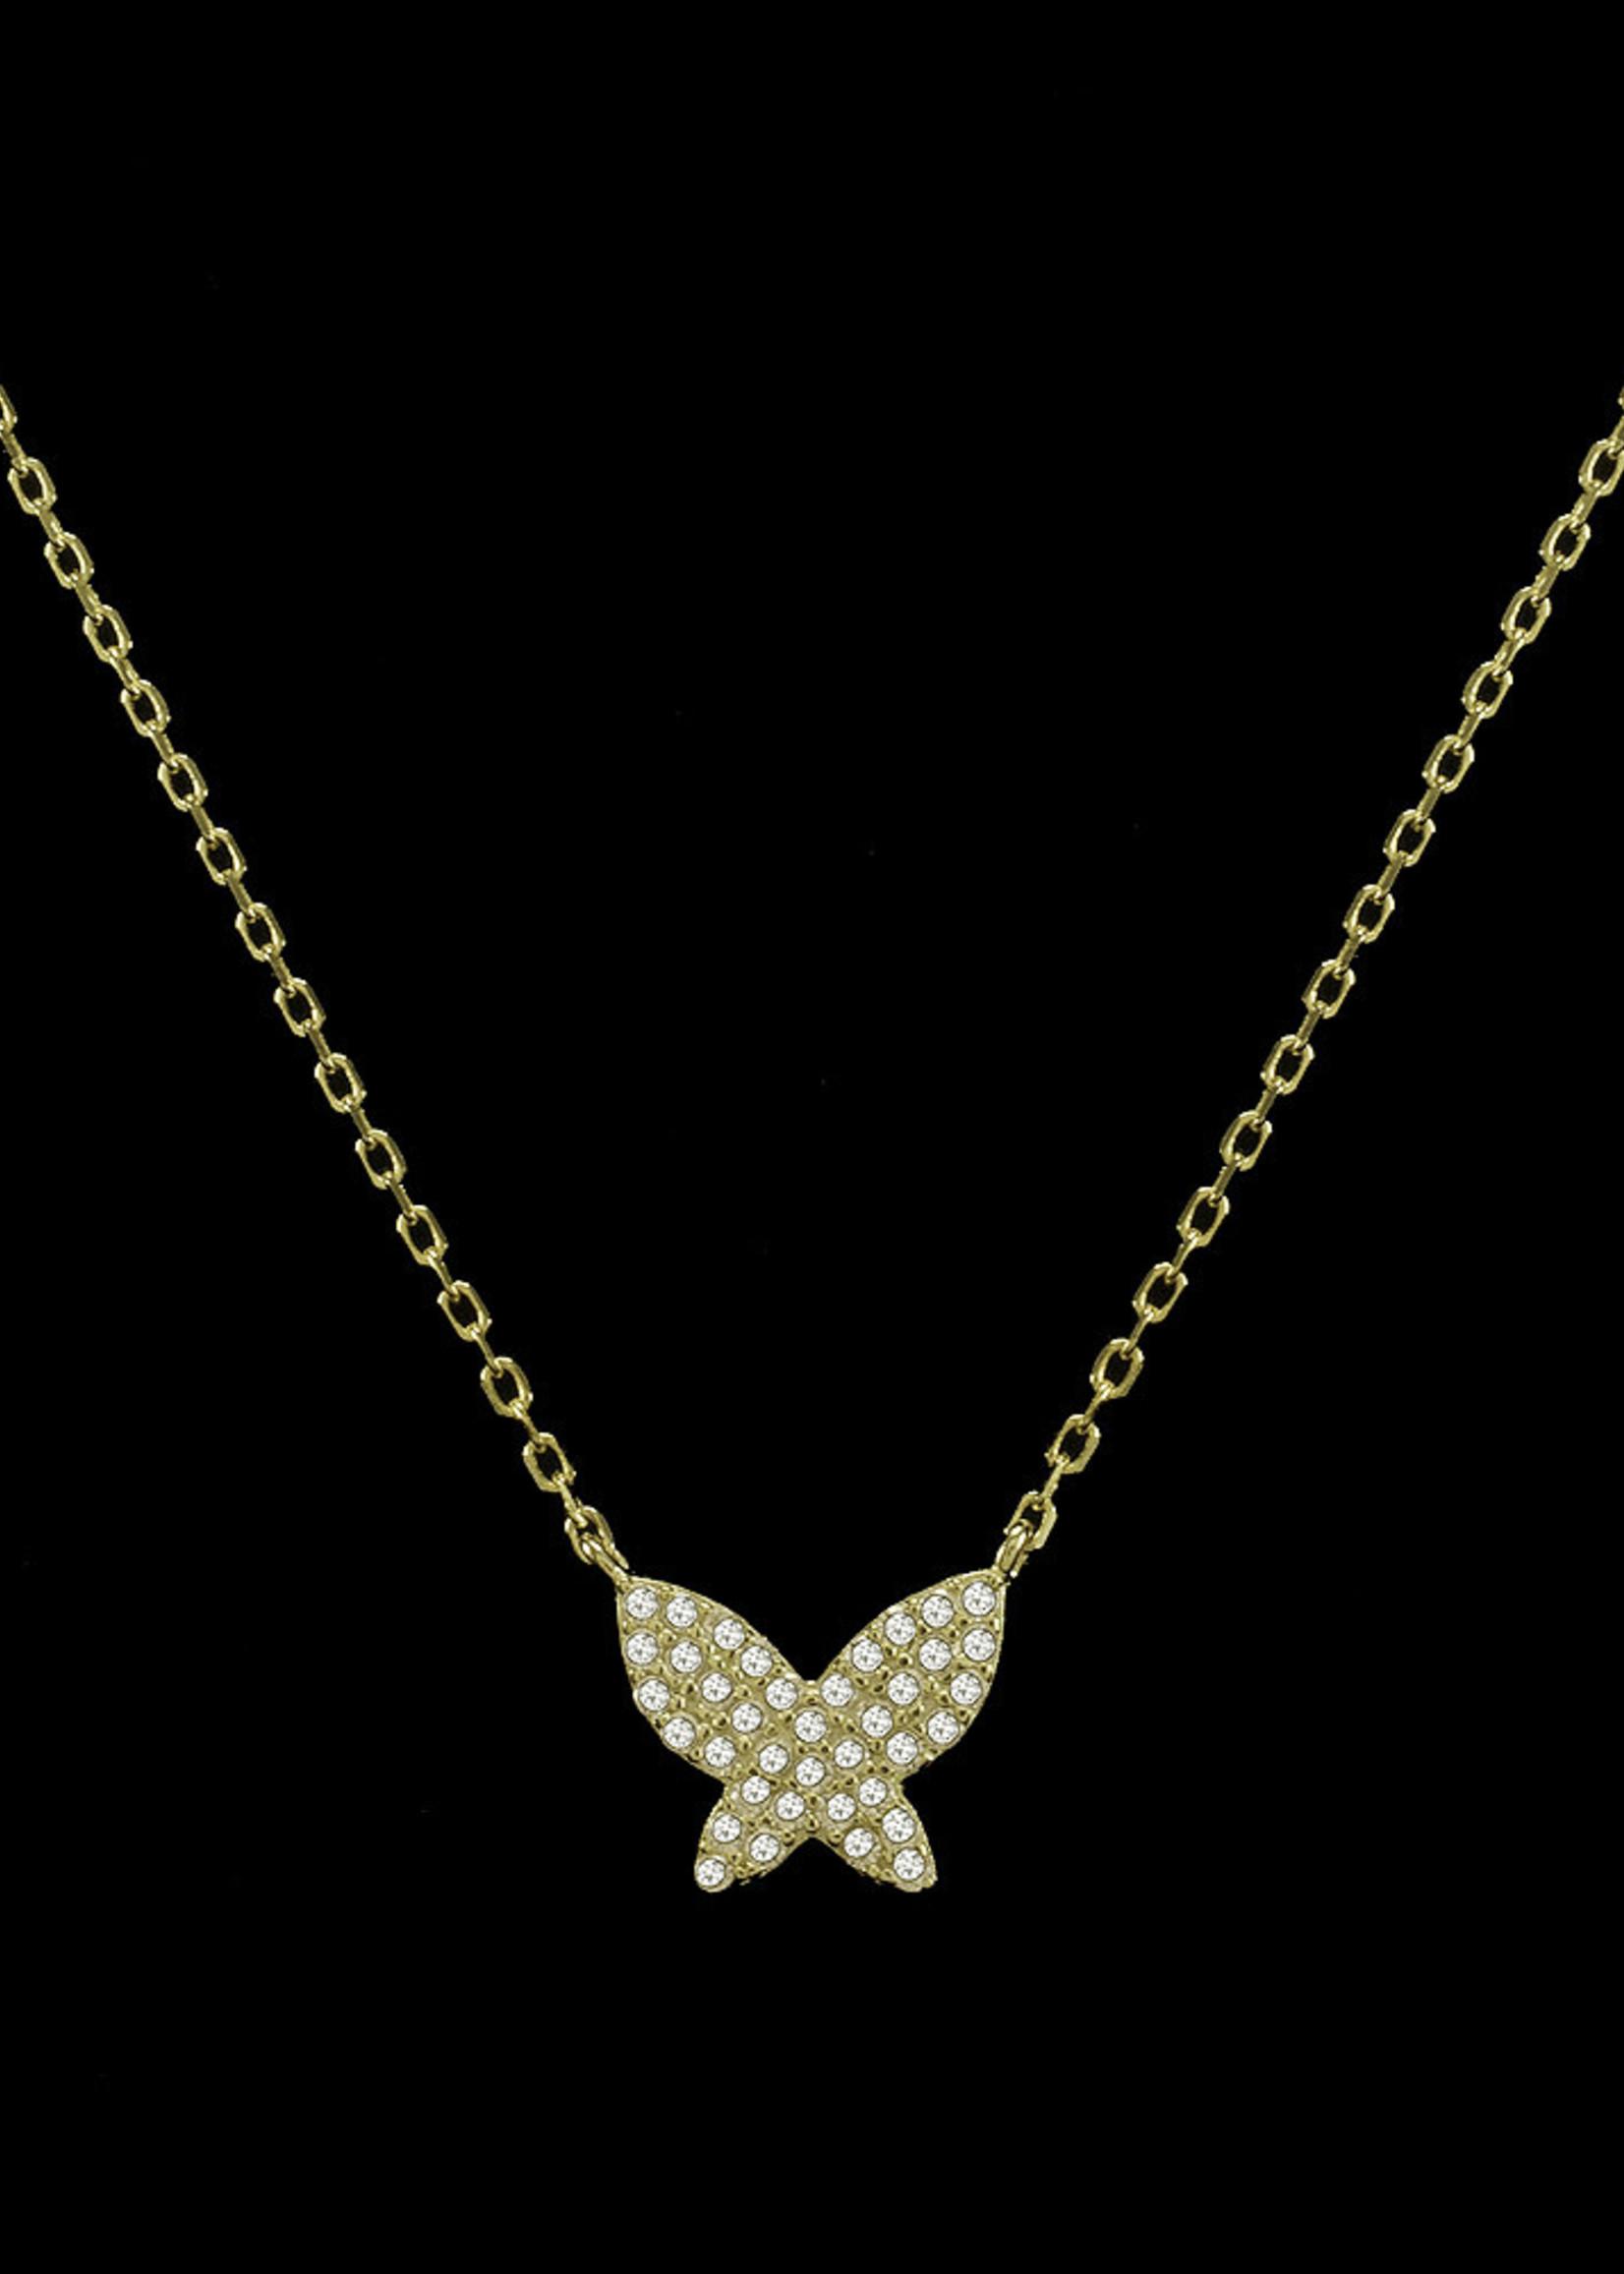 Be-Je Designs Beje - Gold Pave Butterfly Necklace (SS602N)